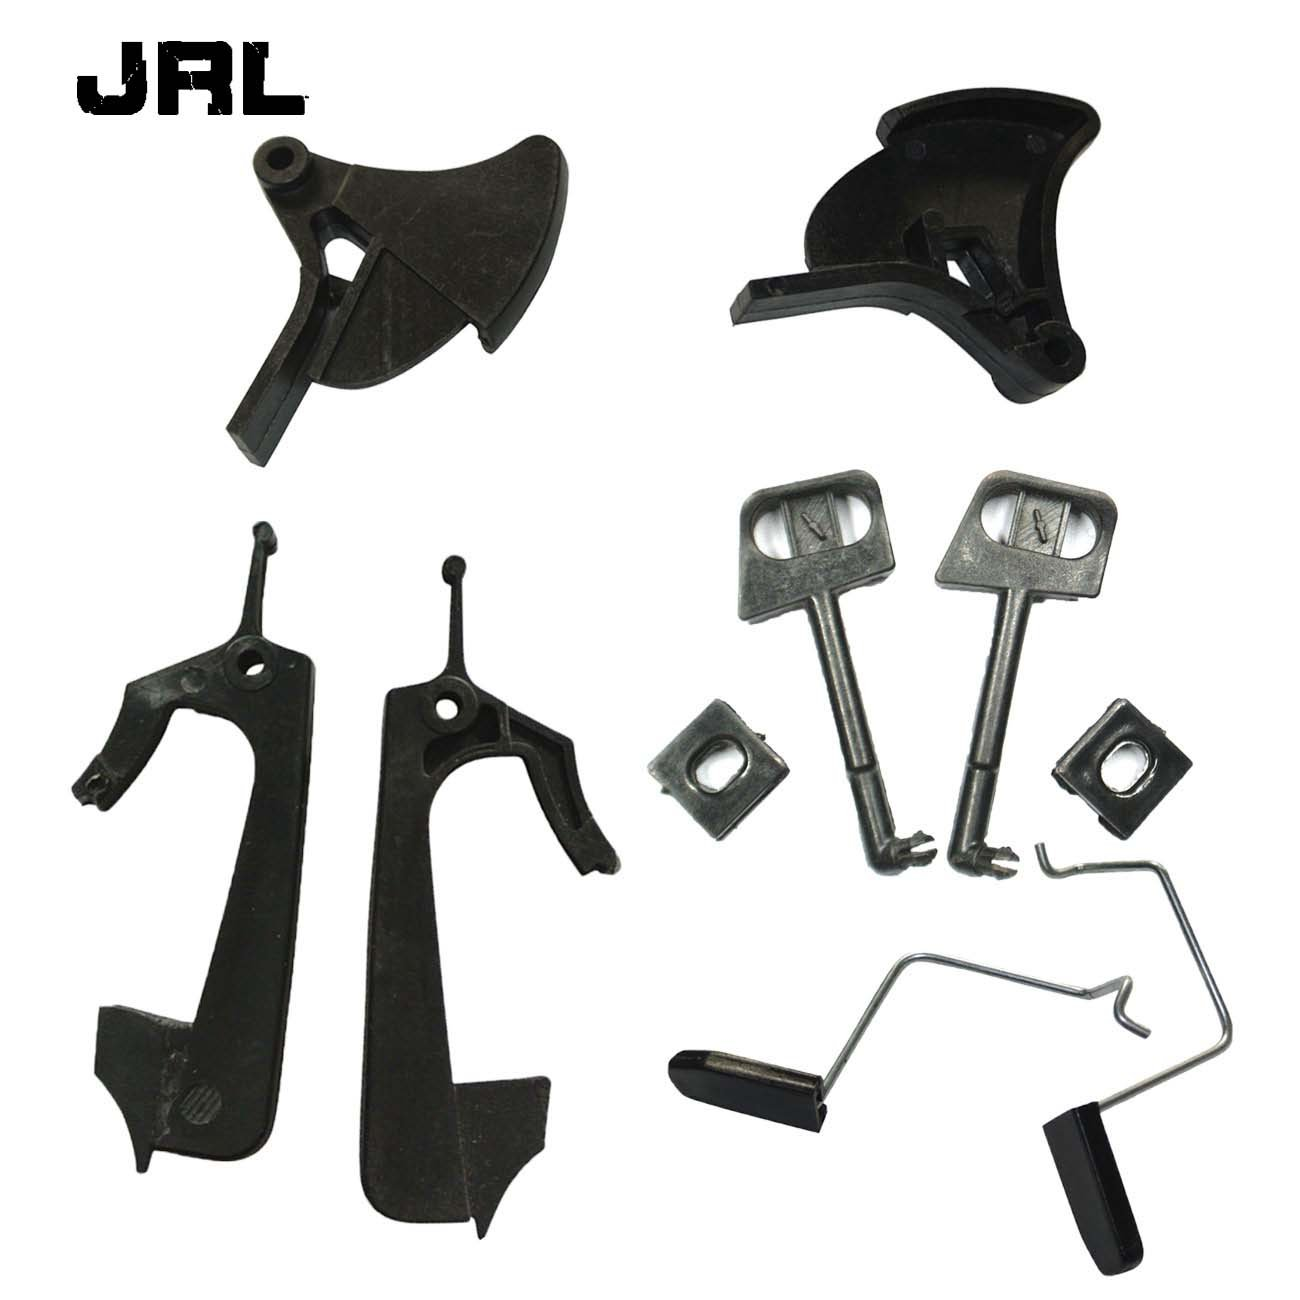 JRL Choke Gashebel Rod Hebel W//Trigger Kit f/ür Chainsaw 36/41/136/137